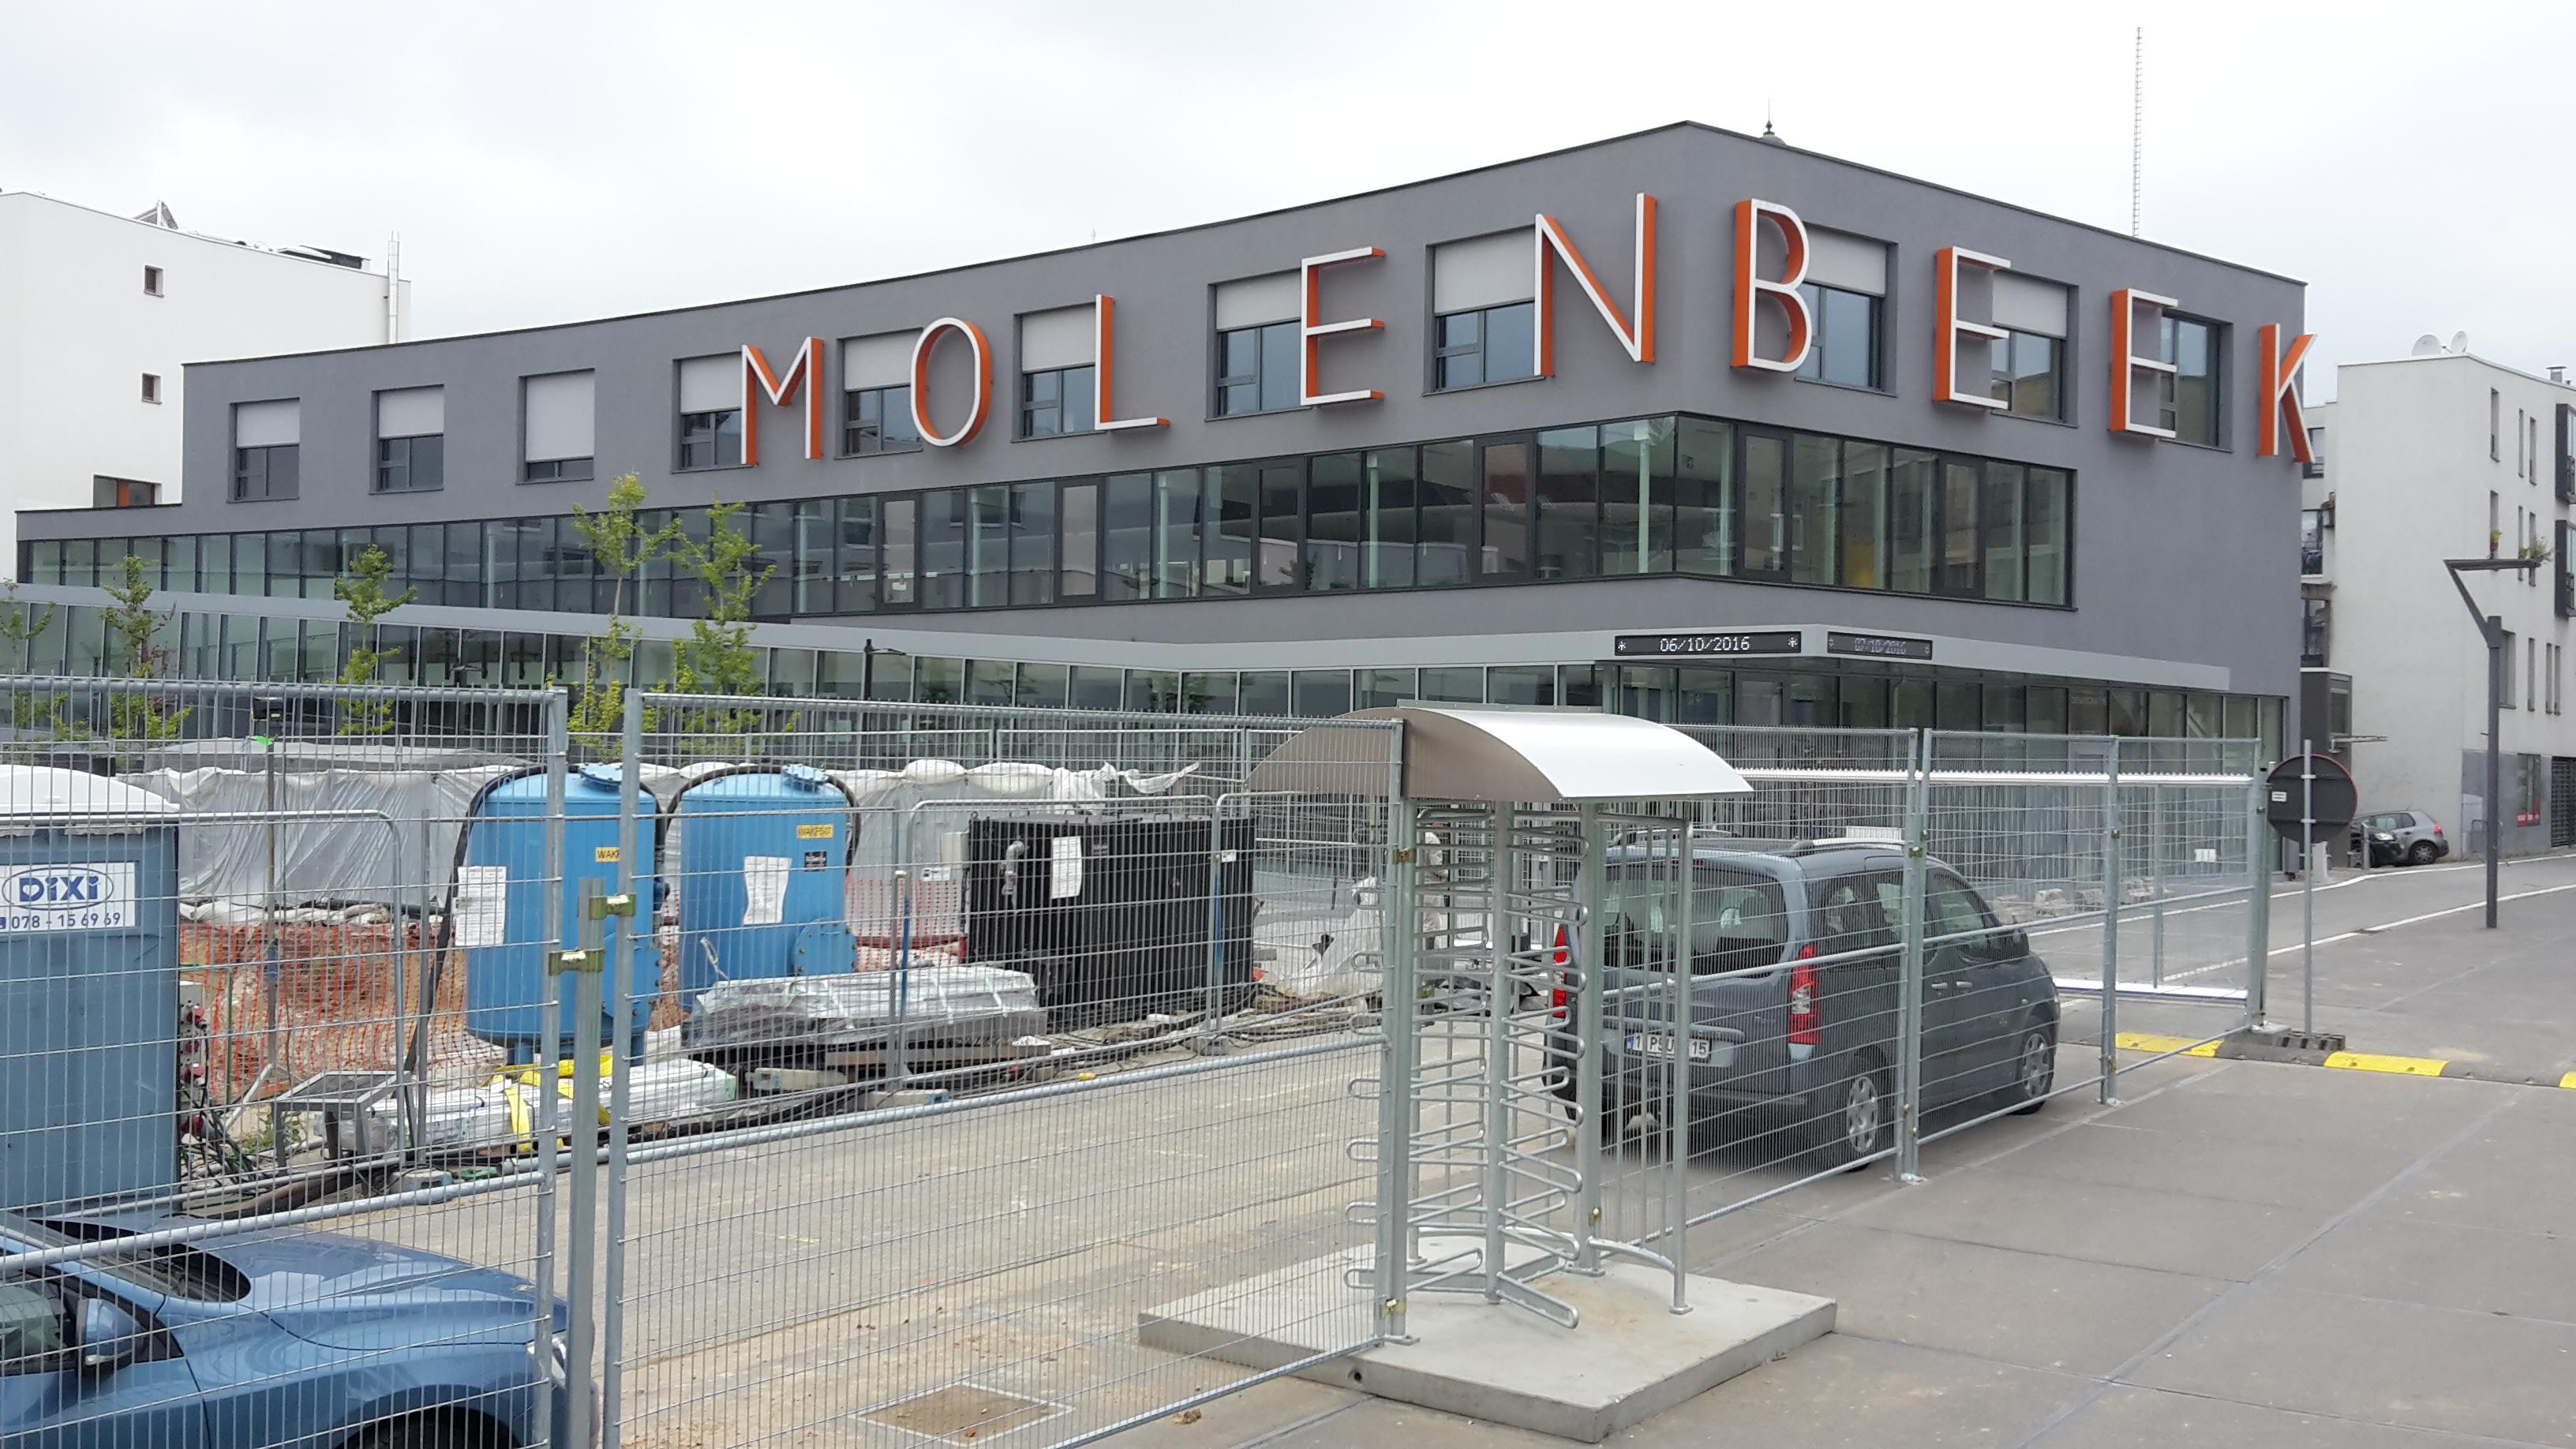 documentation/molenbeek-building.jpg